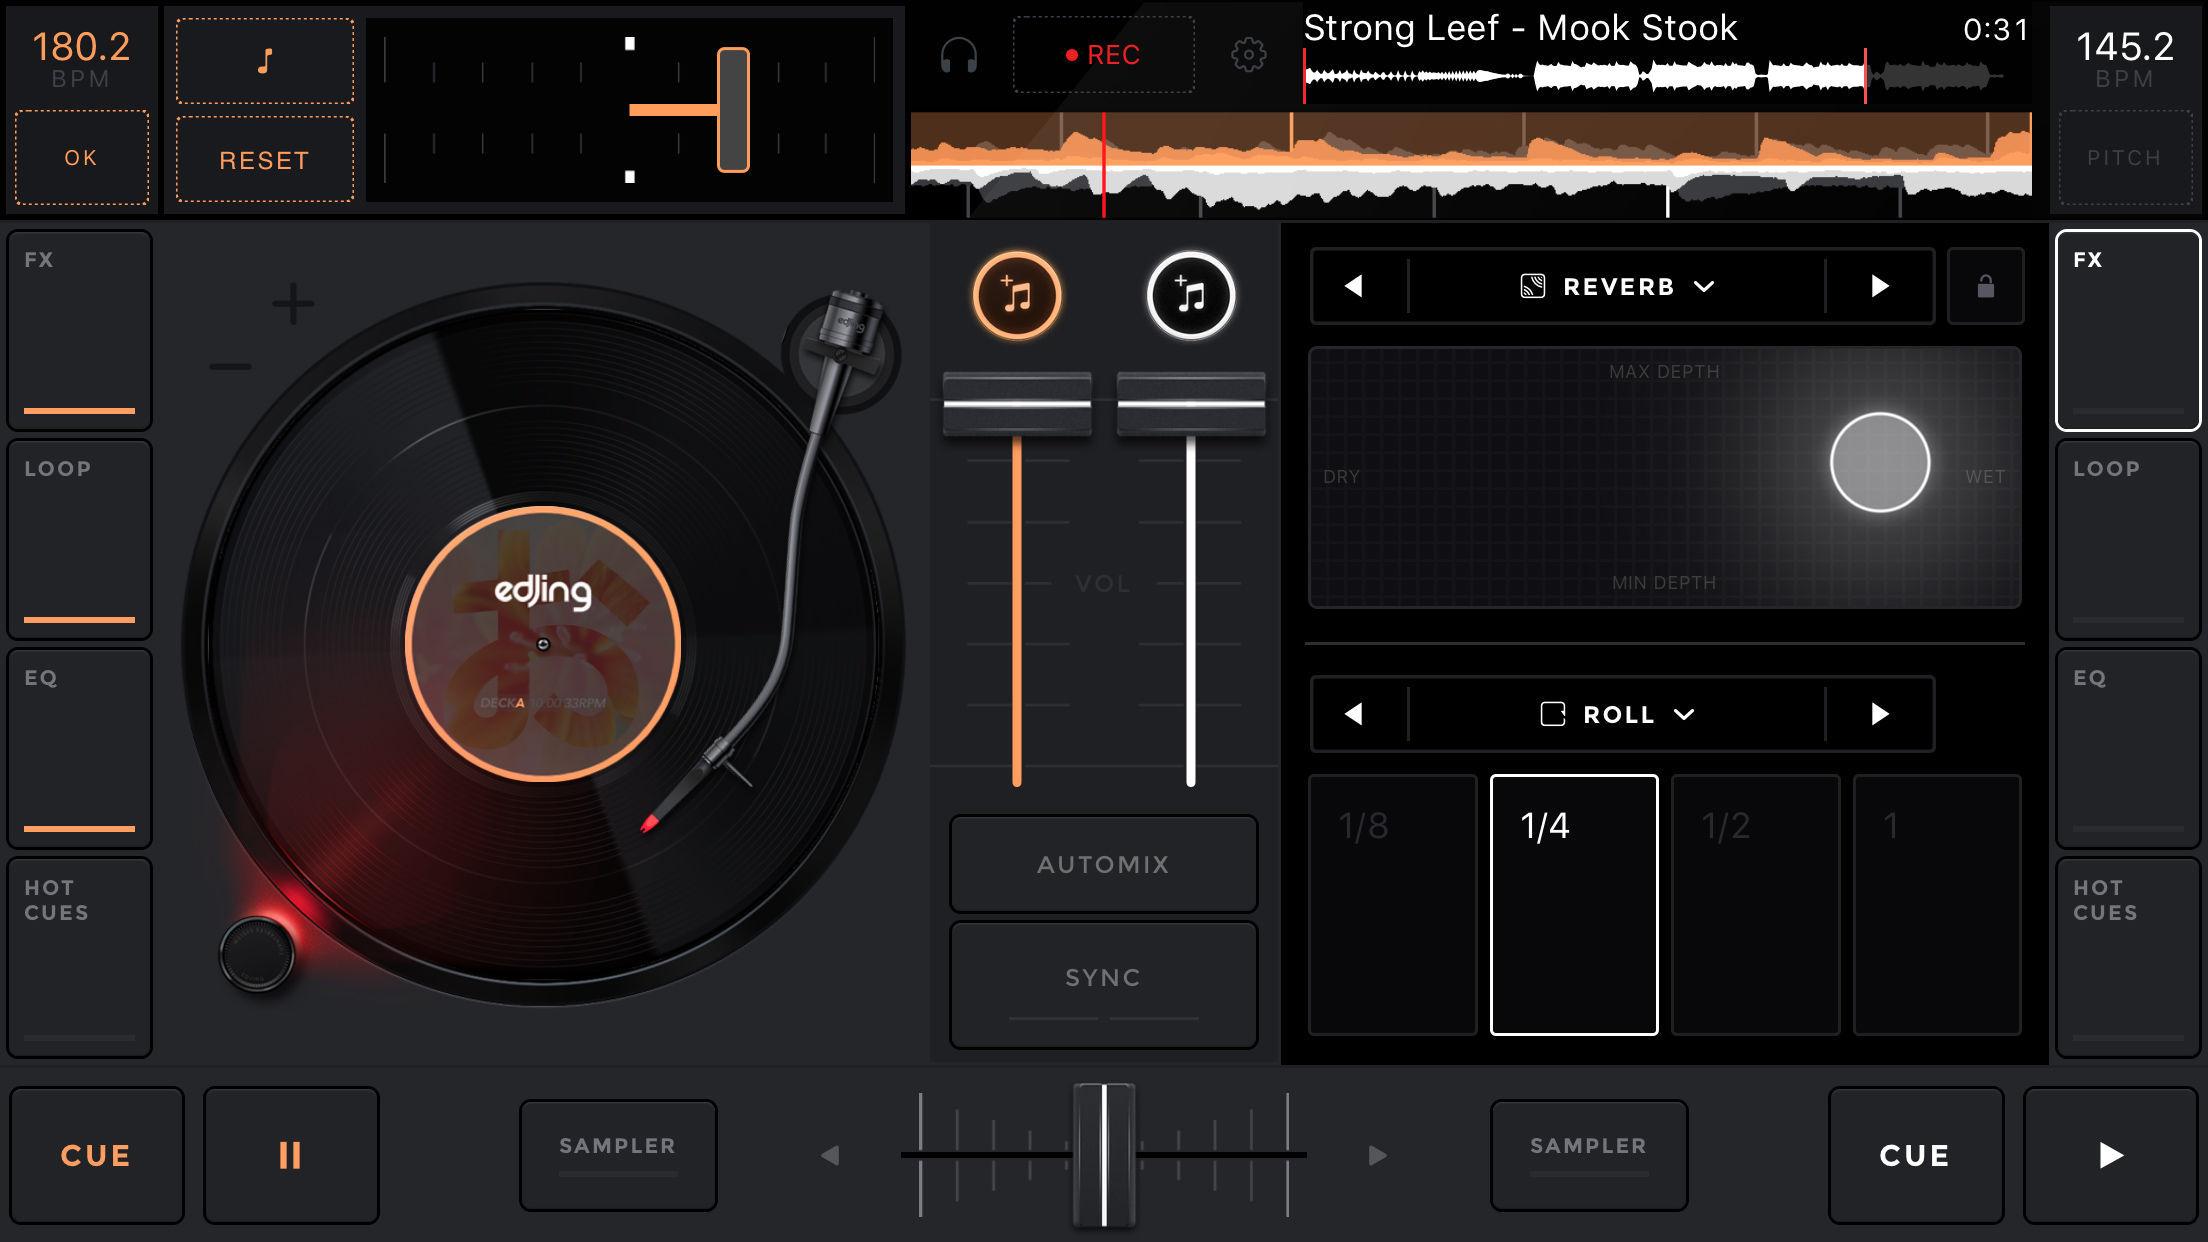 edjing Mix:DJ turntable to remix and scratch music Screenshot